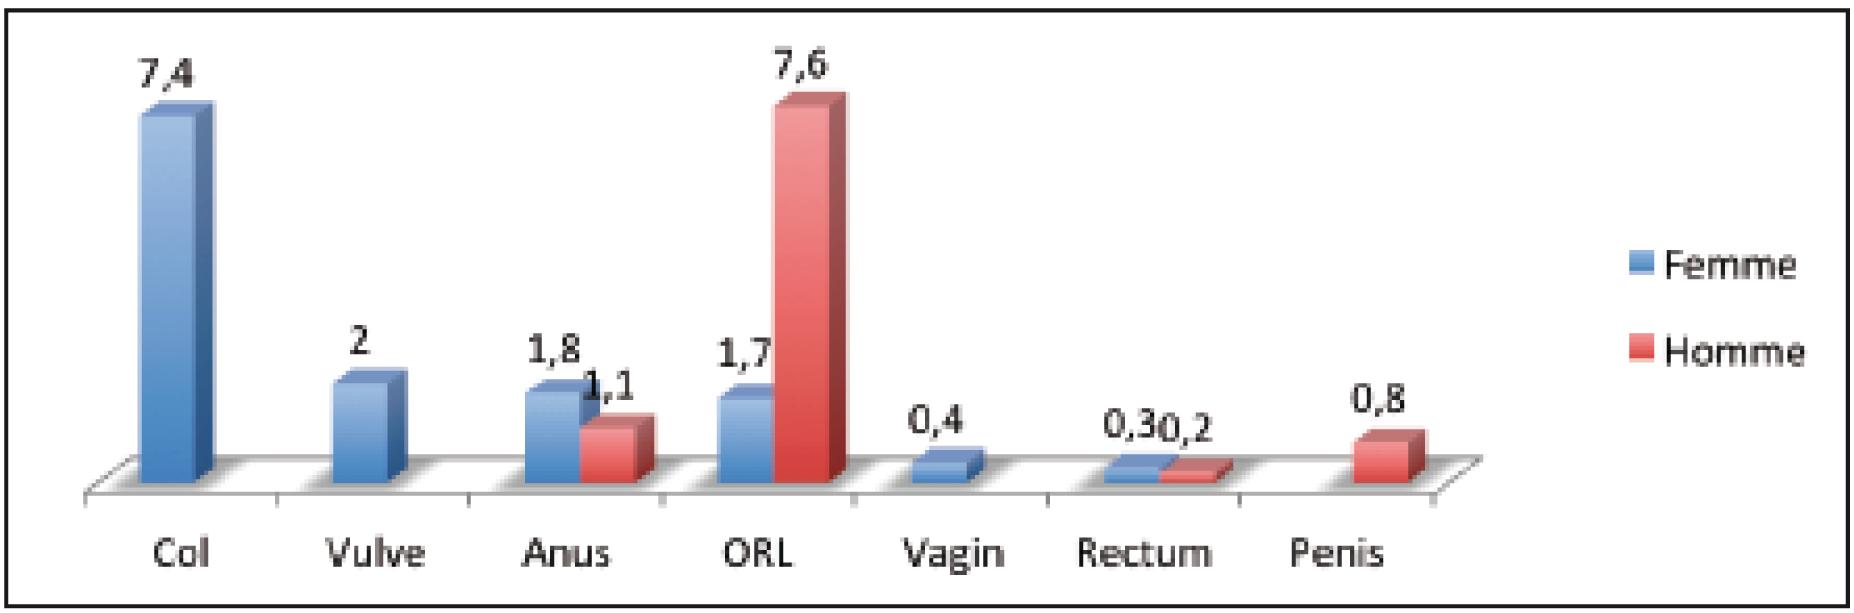 vaccin papillomavirus efficacite cancer de prostata biologia molecular